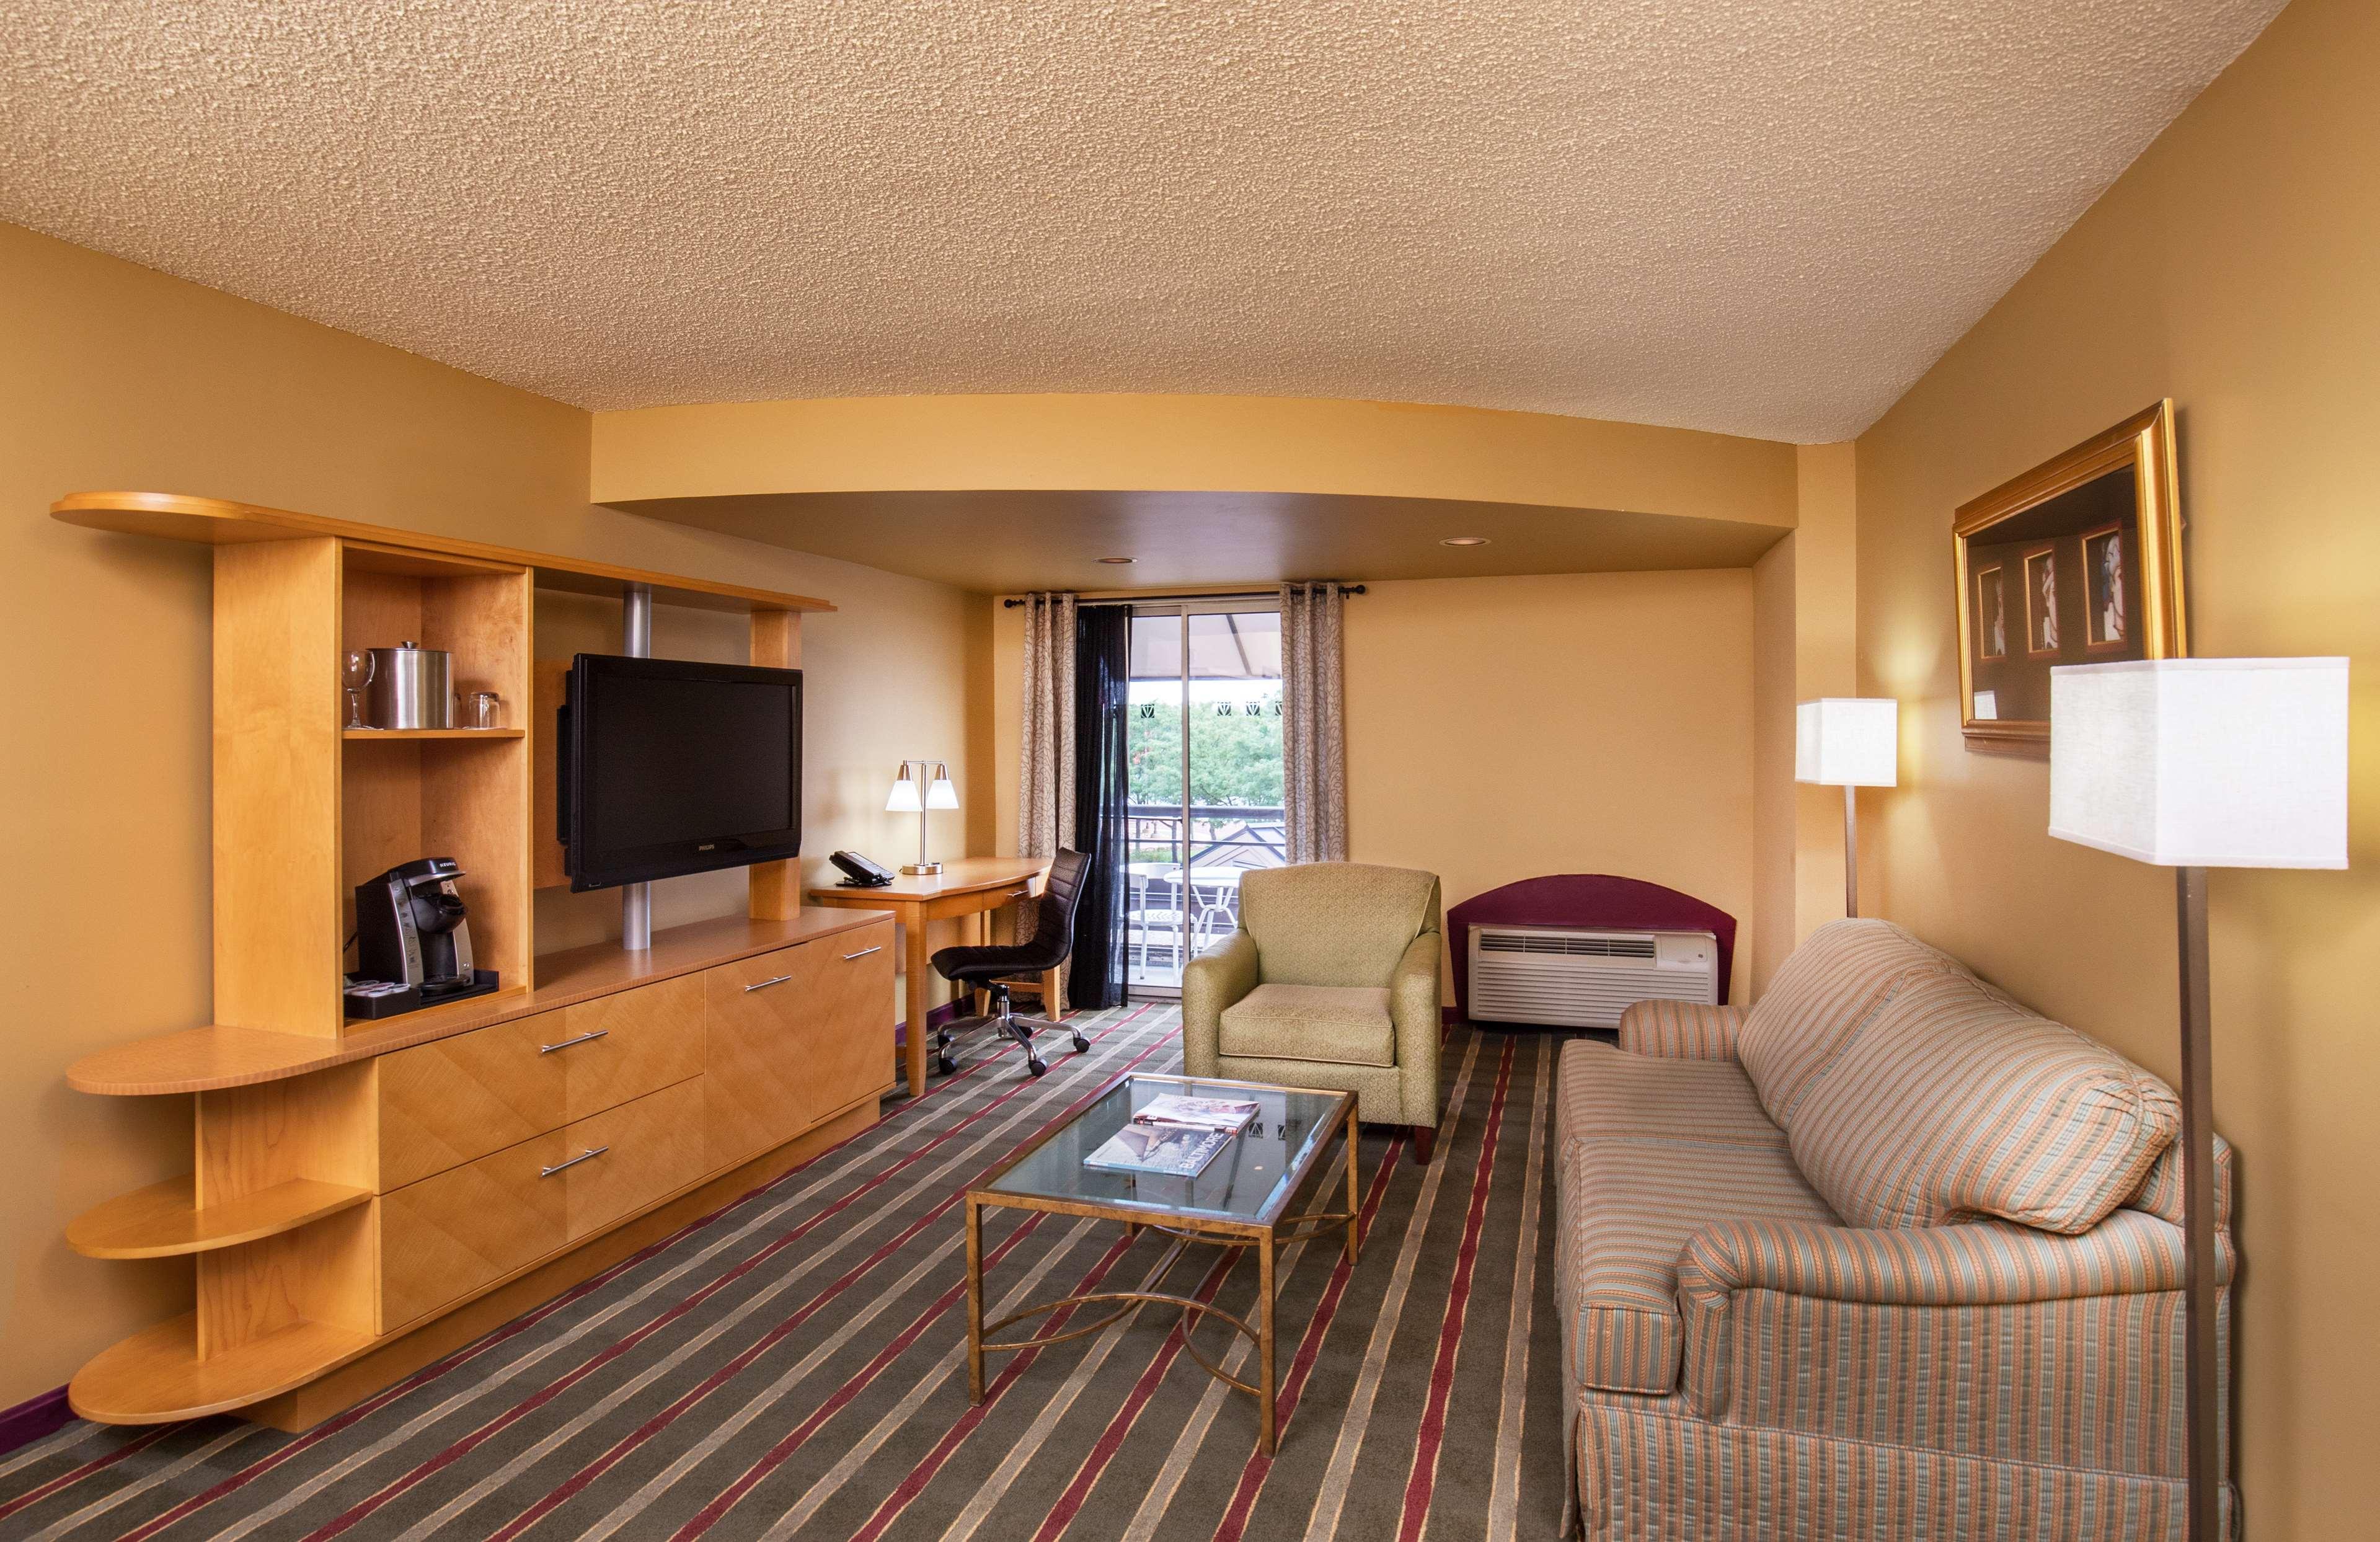 Pier 5 Hotel Baltimore, Curio Collection by Hilton image 14